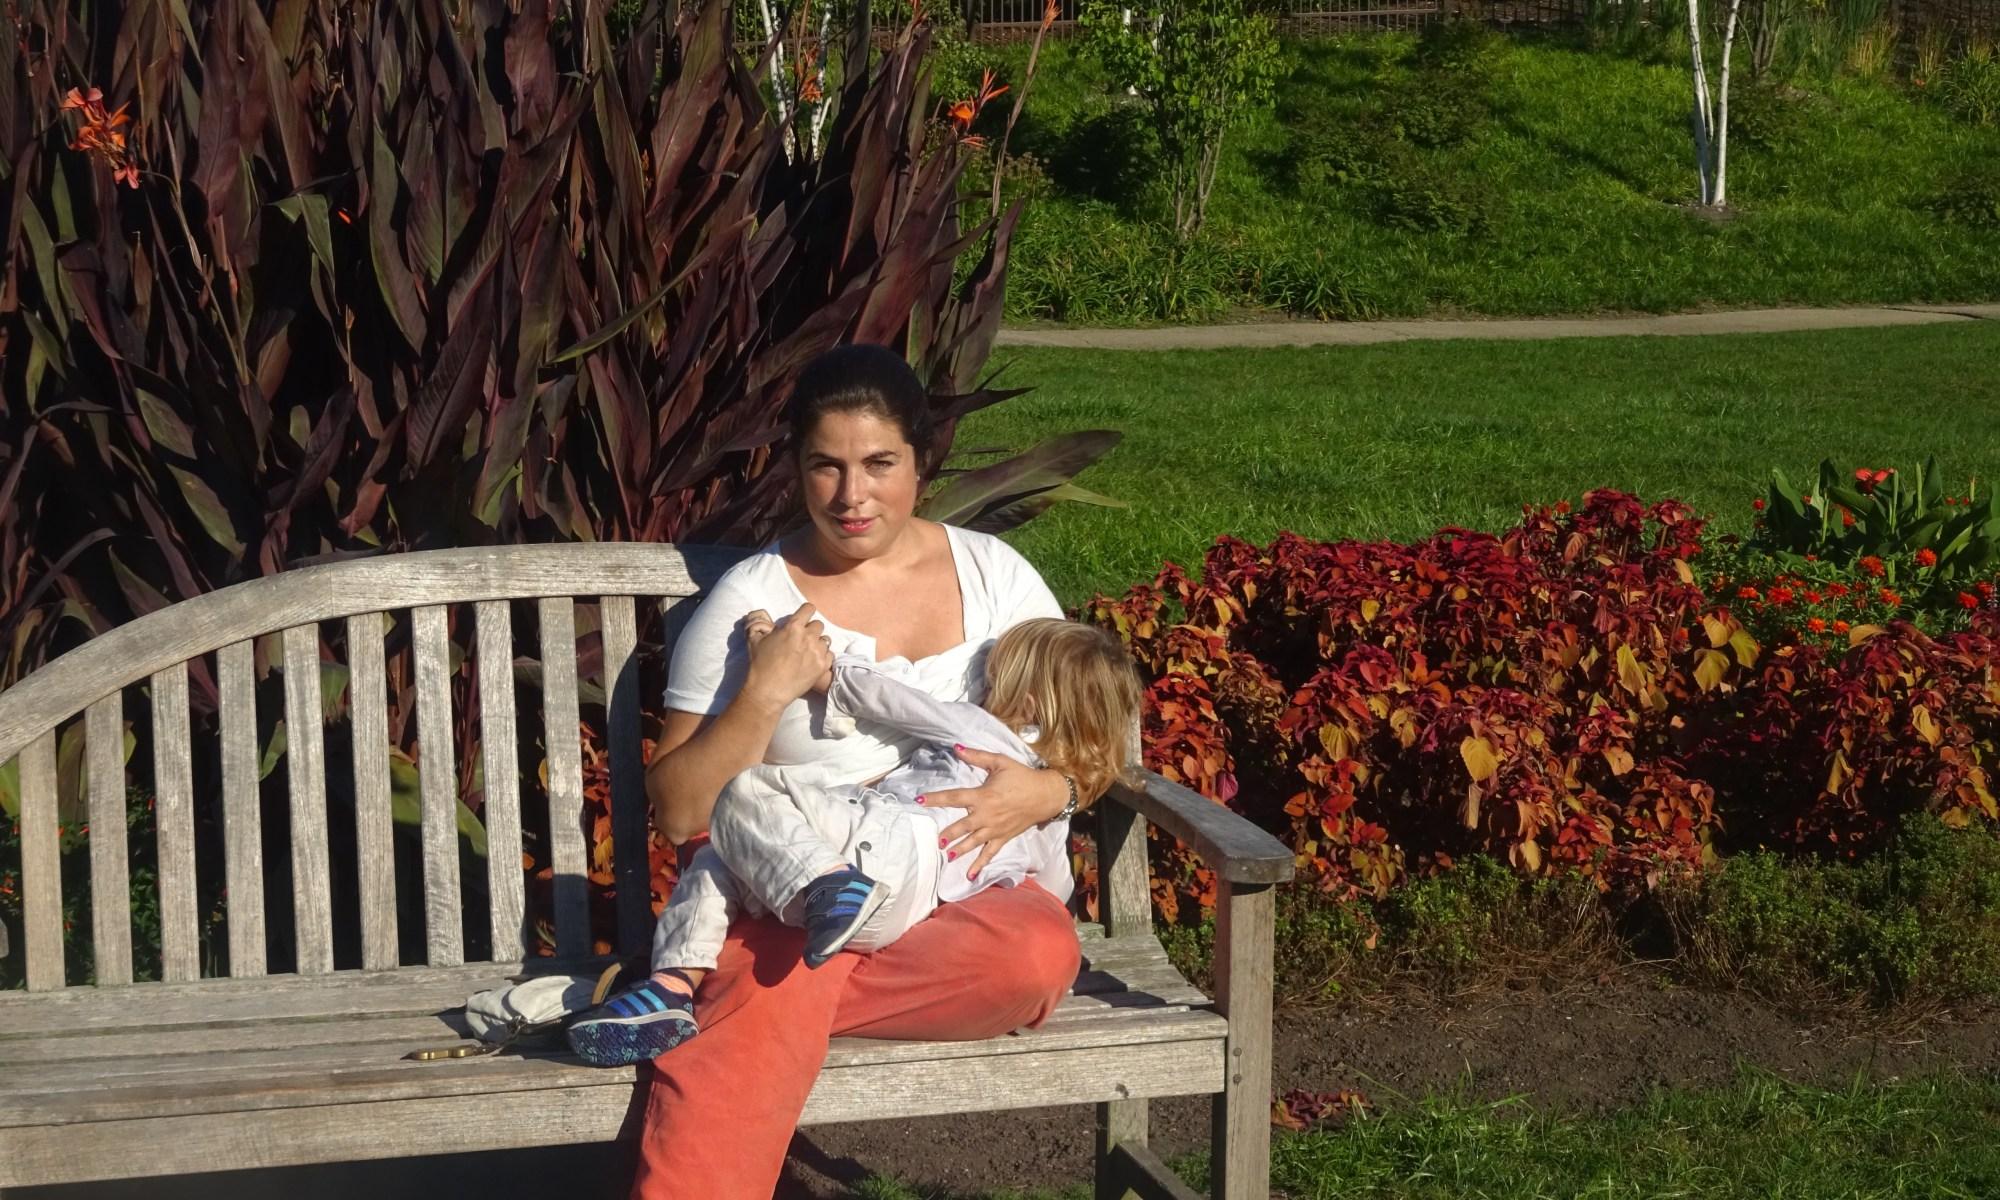 Amother sitting ona bench breastfeeding her child